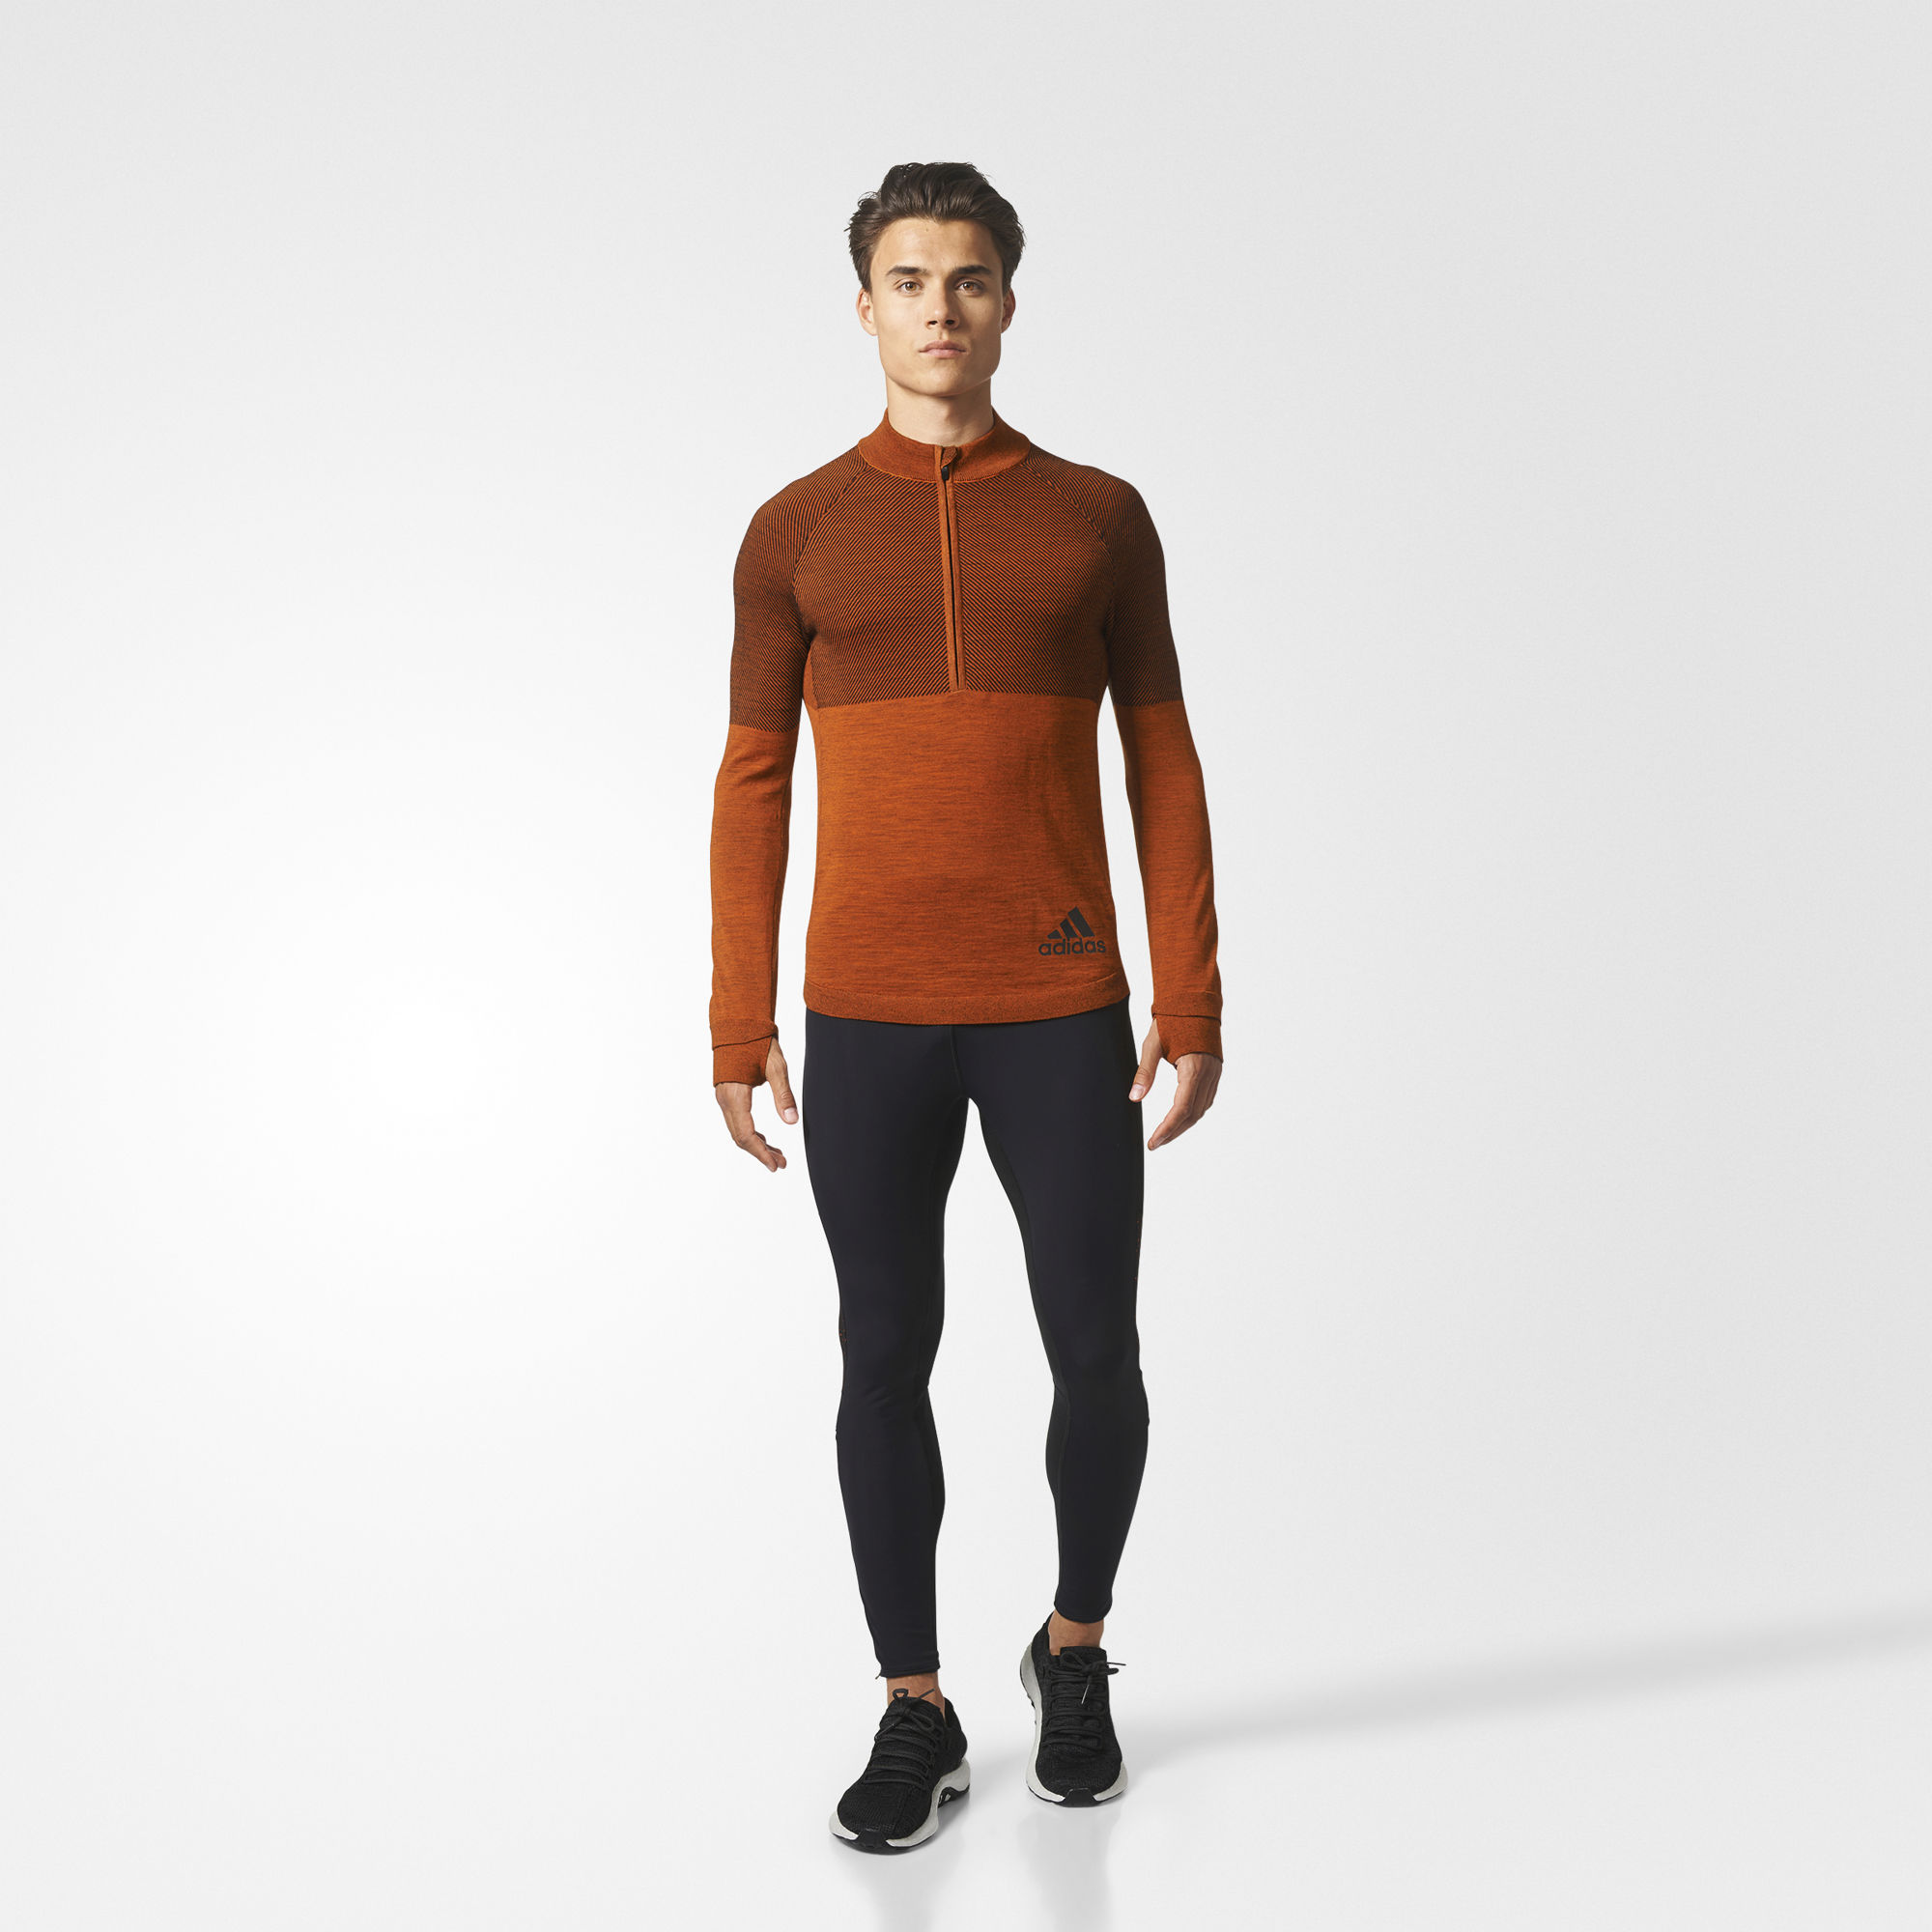 adidas Climaheat Primeknit 1/2 Zip in Orange Schwarz